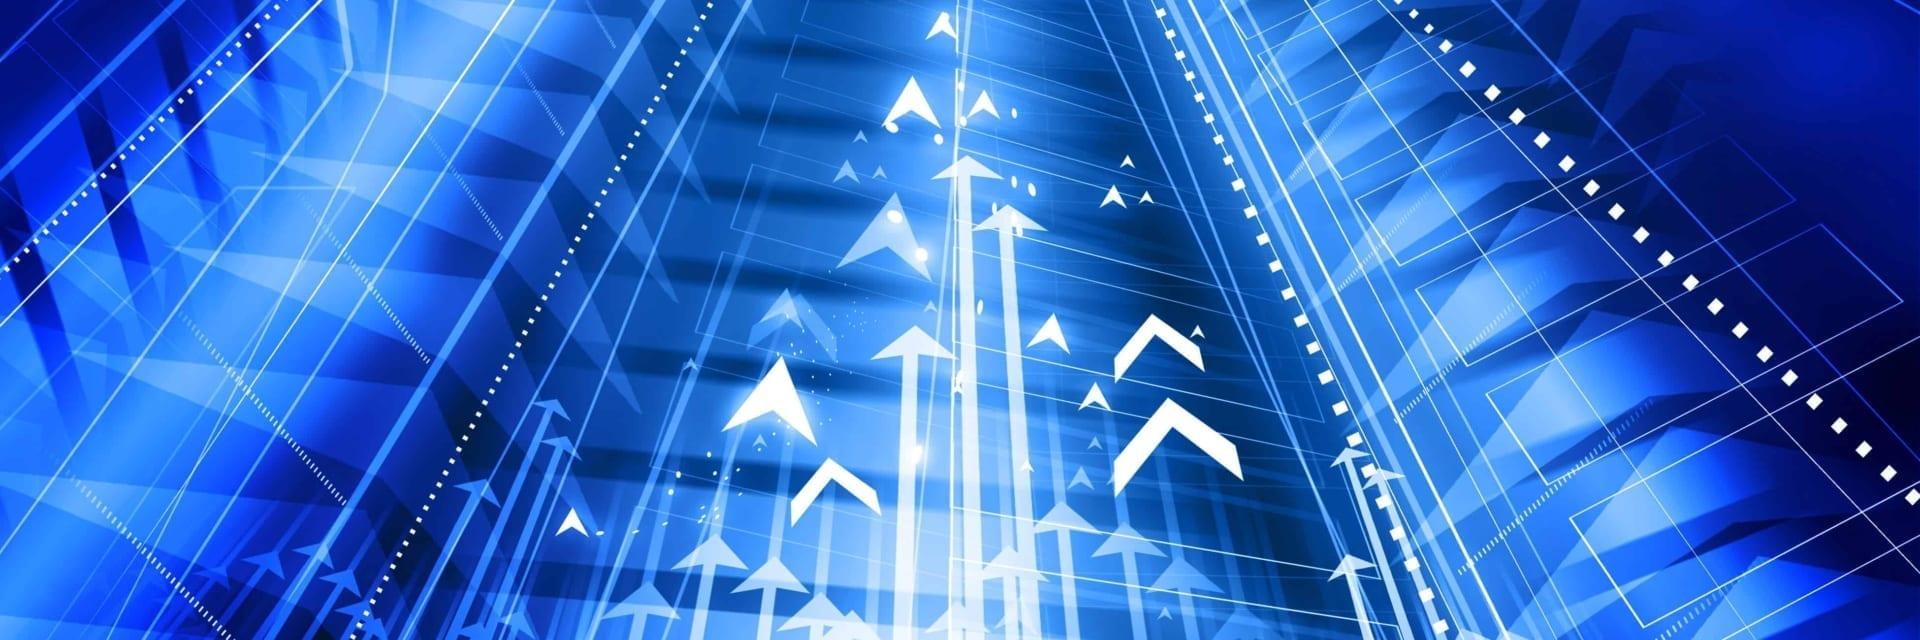 Enhanced Category Management Creates New Efficiency Levels Through Automation to Futureproof Enterprise Spend Management